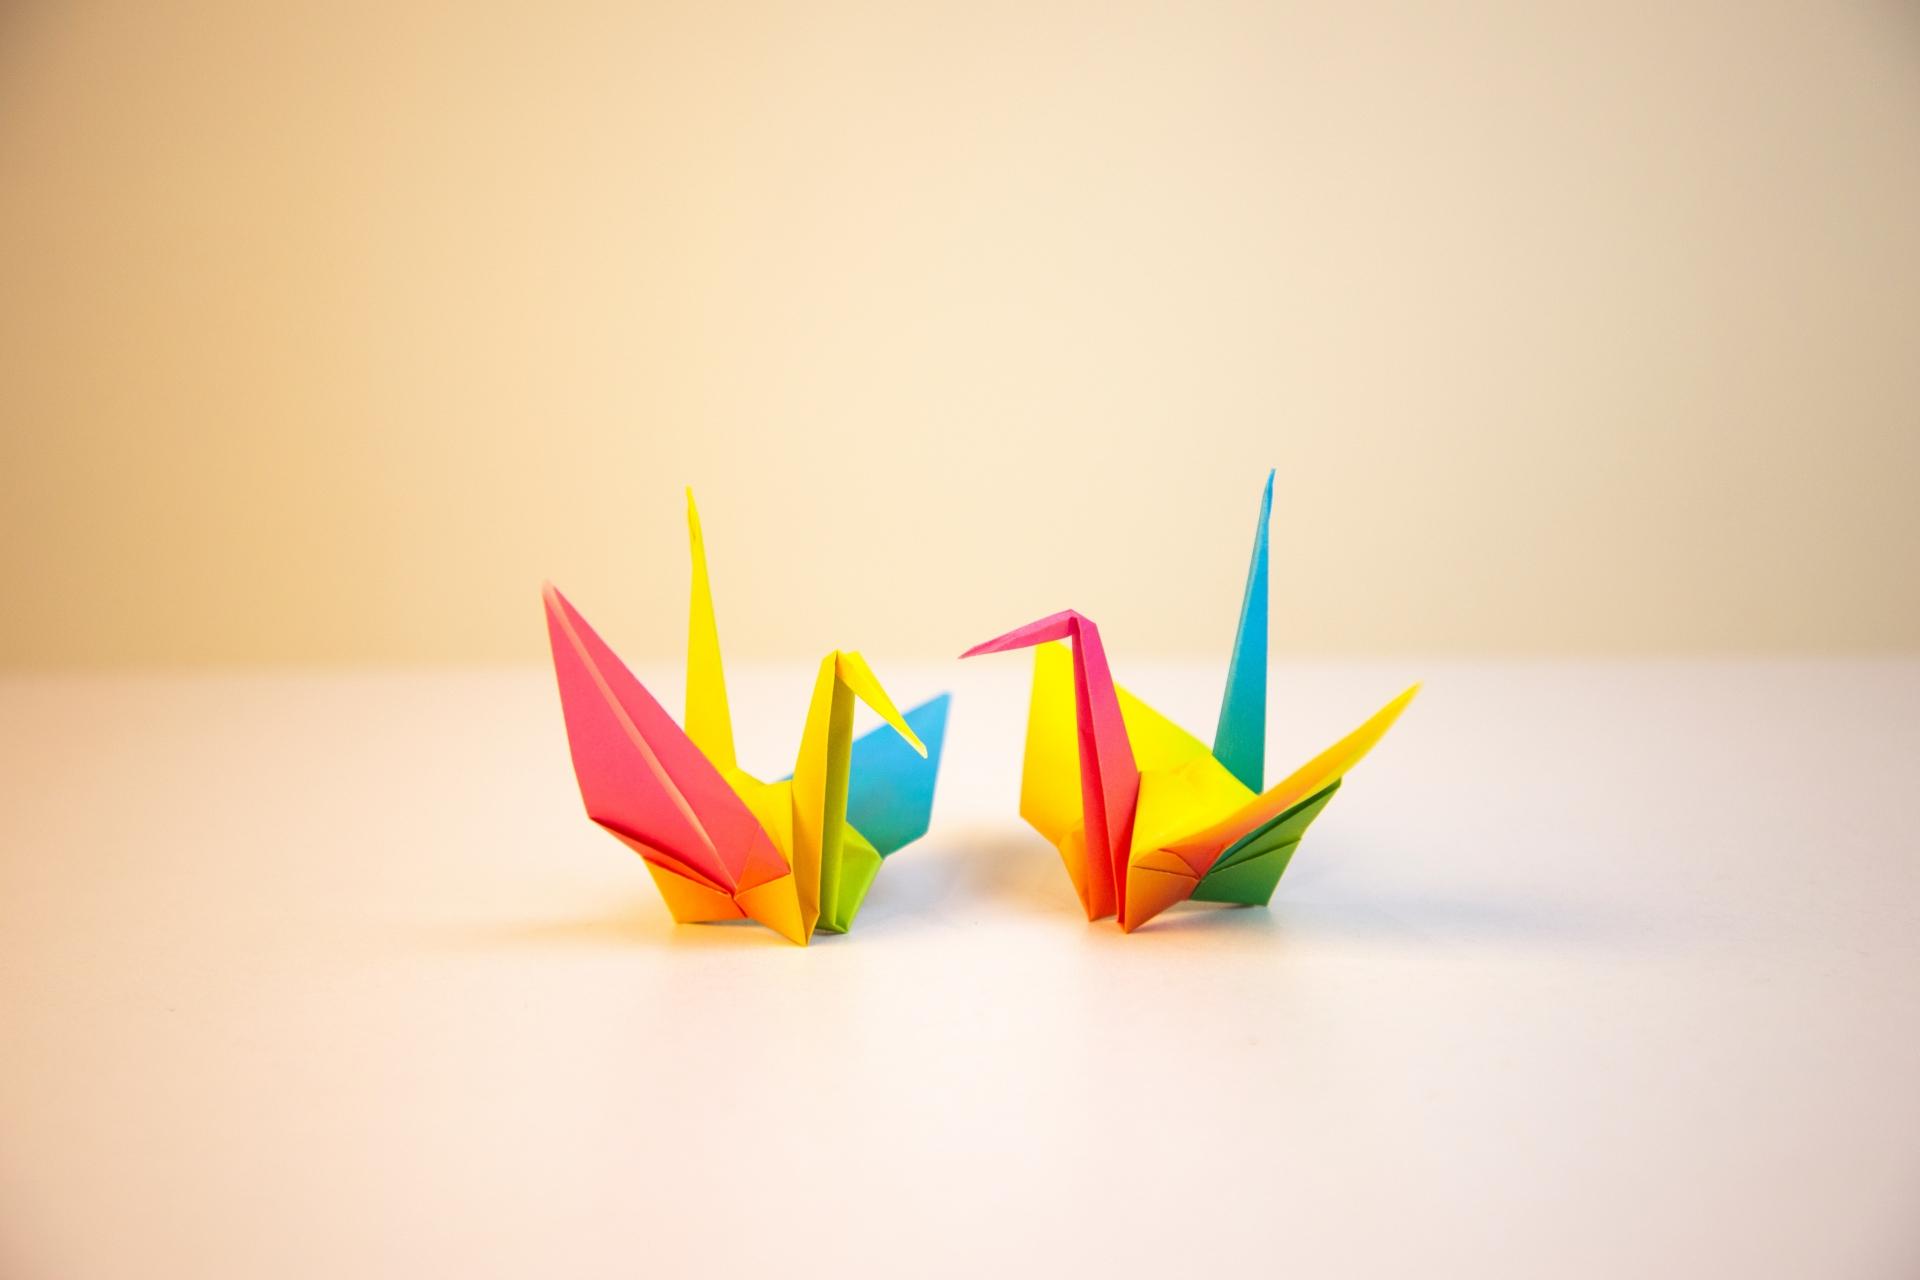 LisboaCool_Blog_Museu do Oriente organiza Oficinas de Caligrafia e Origami